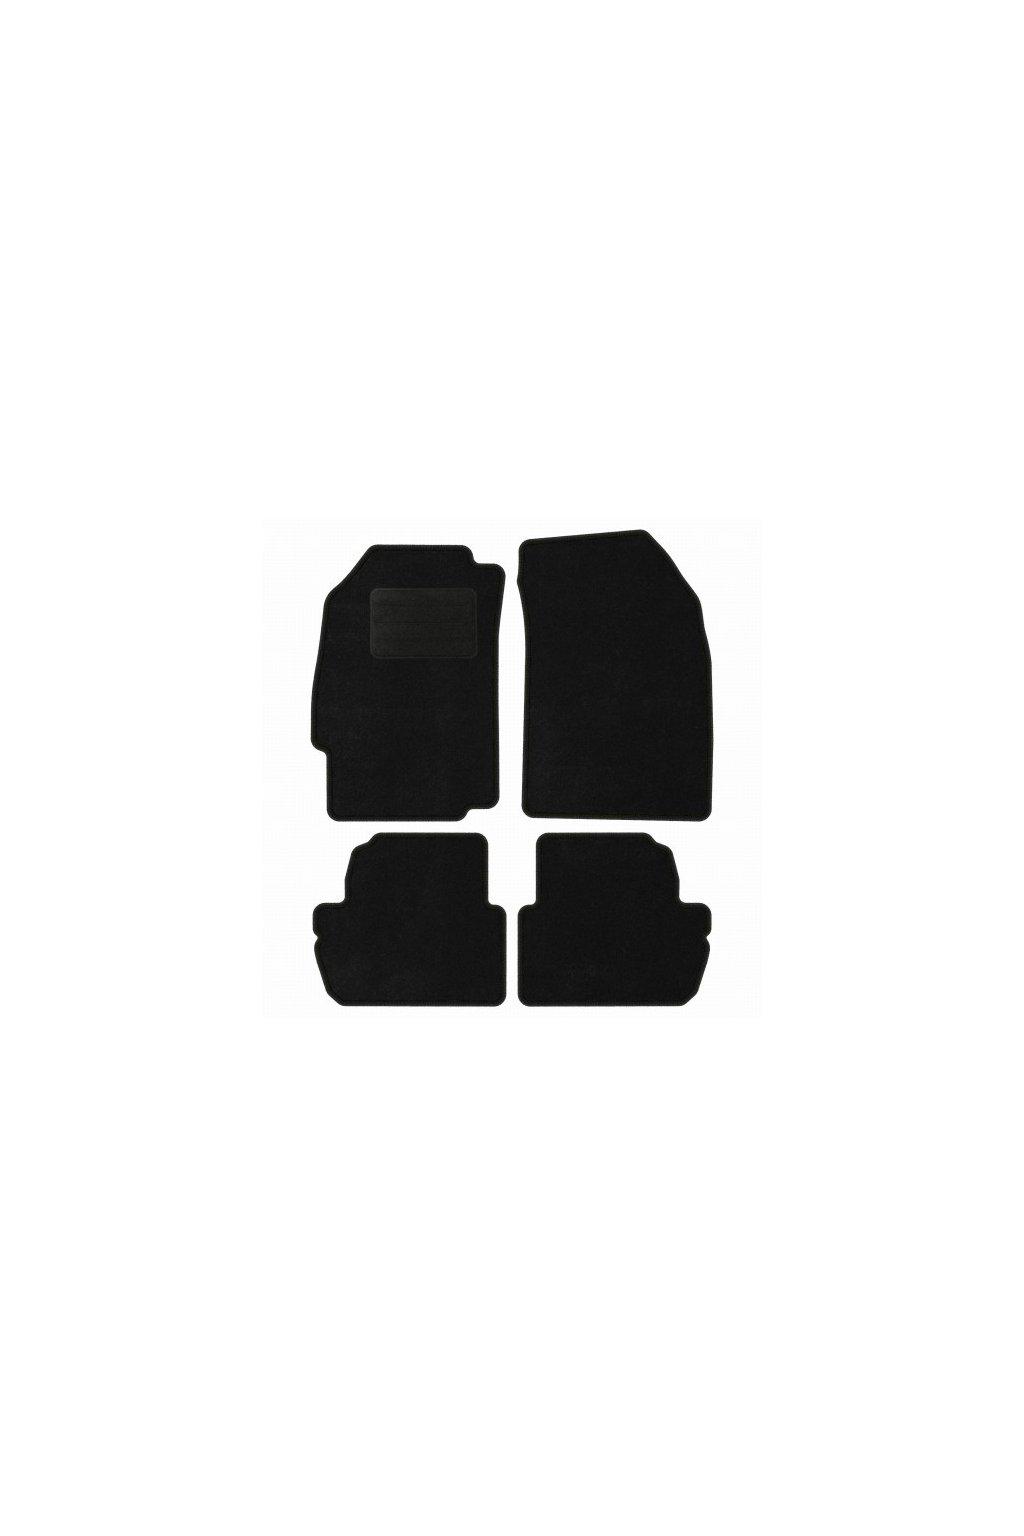 Koberce textilni ACR CHEVROLET Spark III [M300] 2009-2012 černá